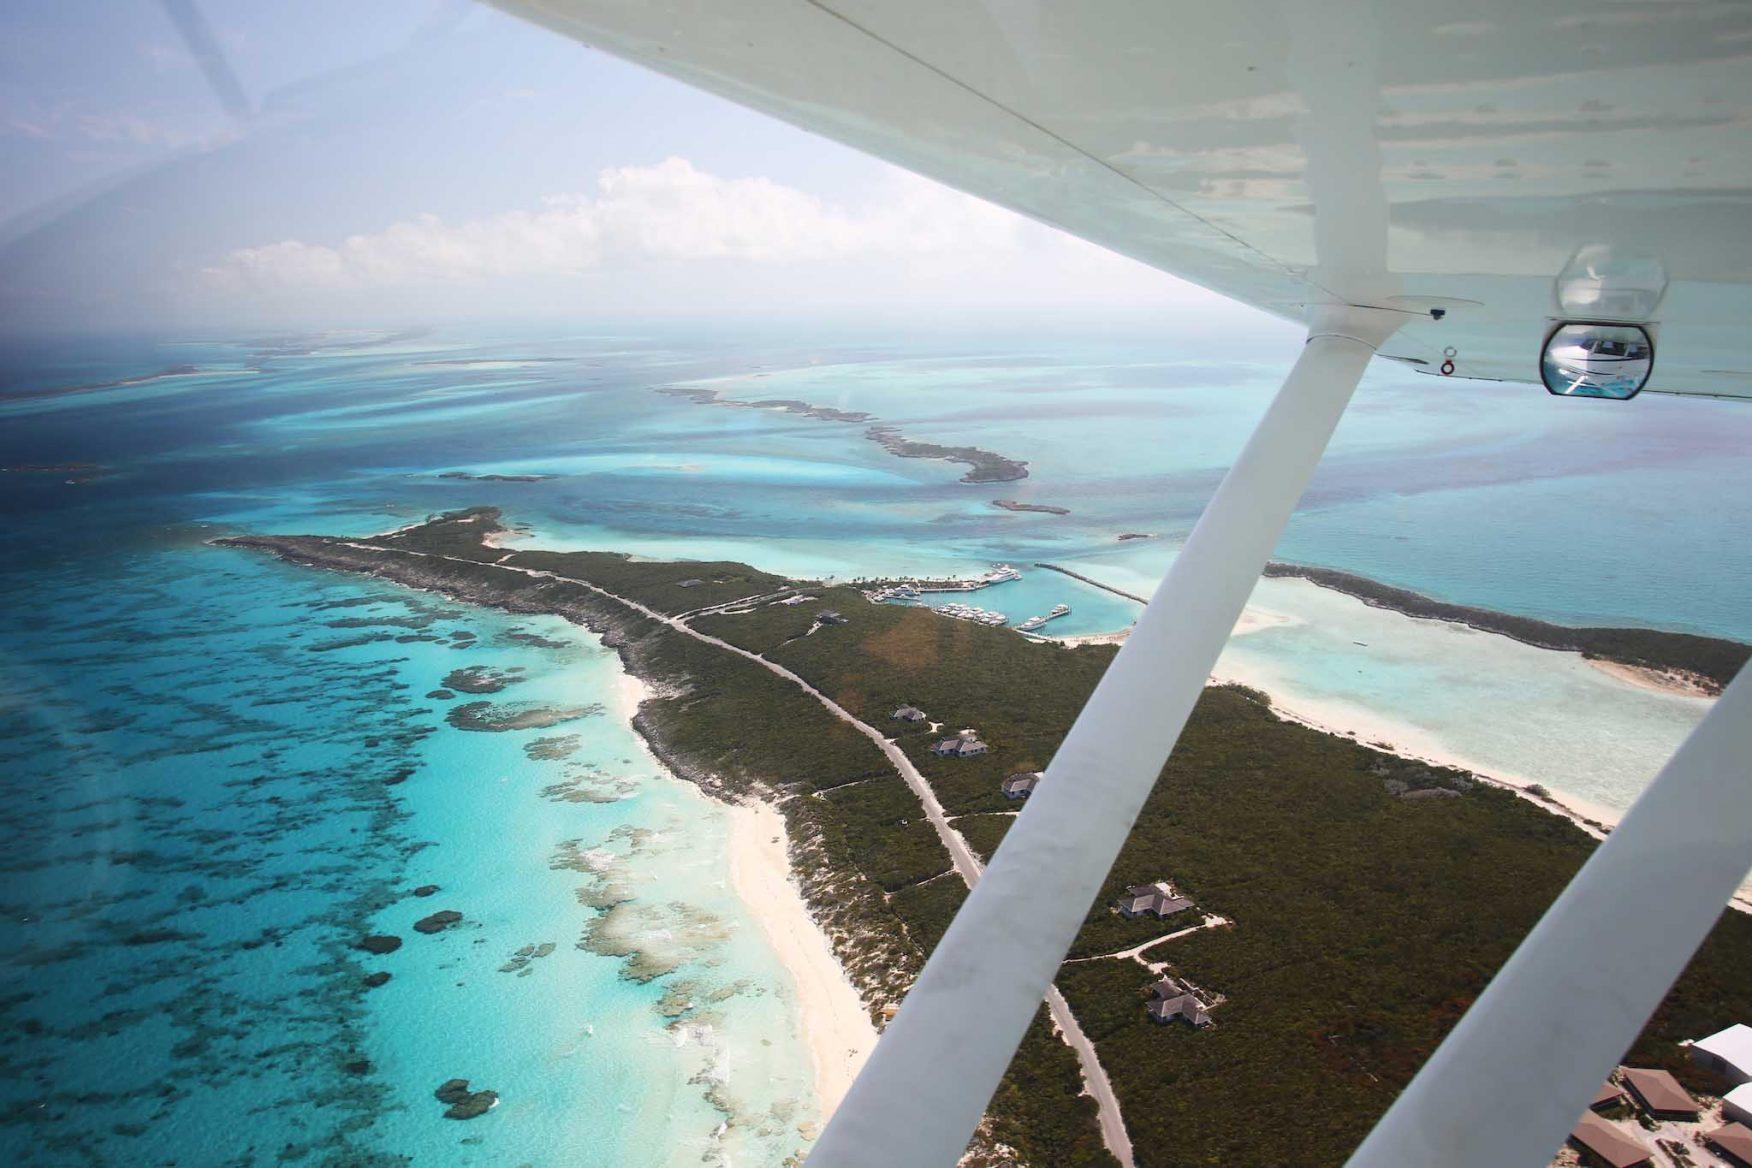 caribbean-cruising-pirate-quest-4